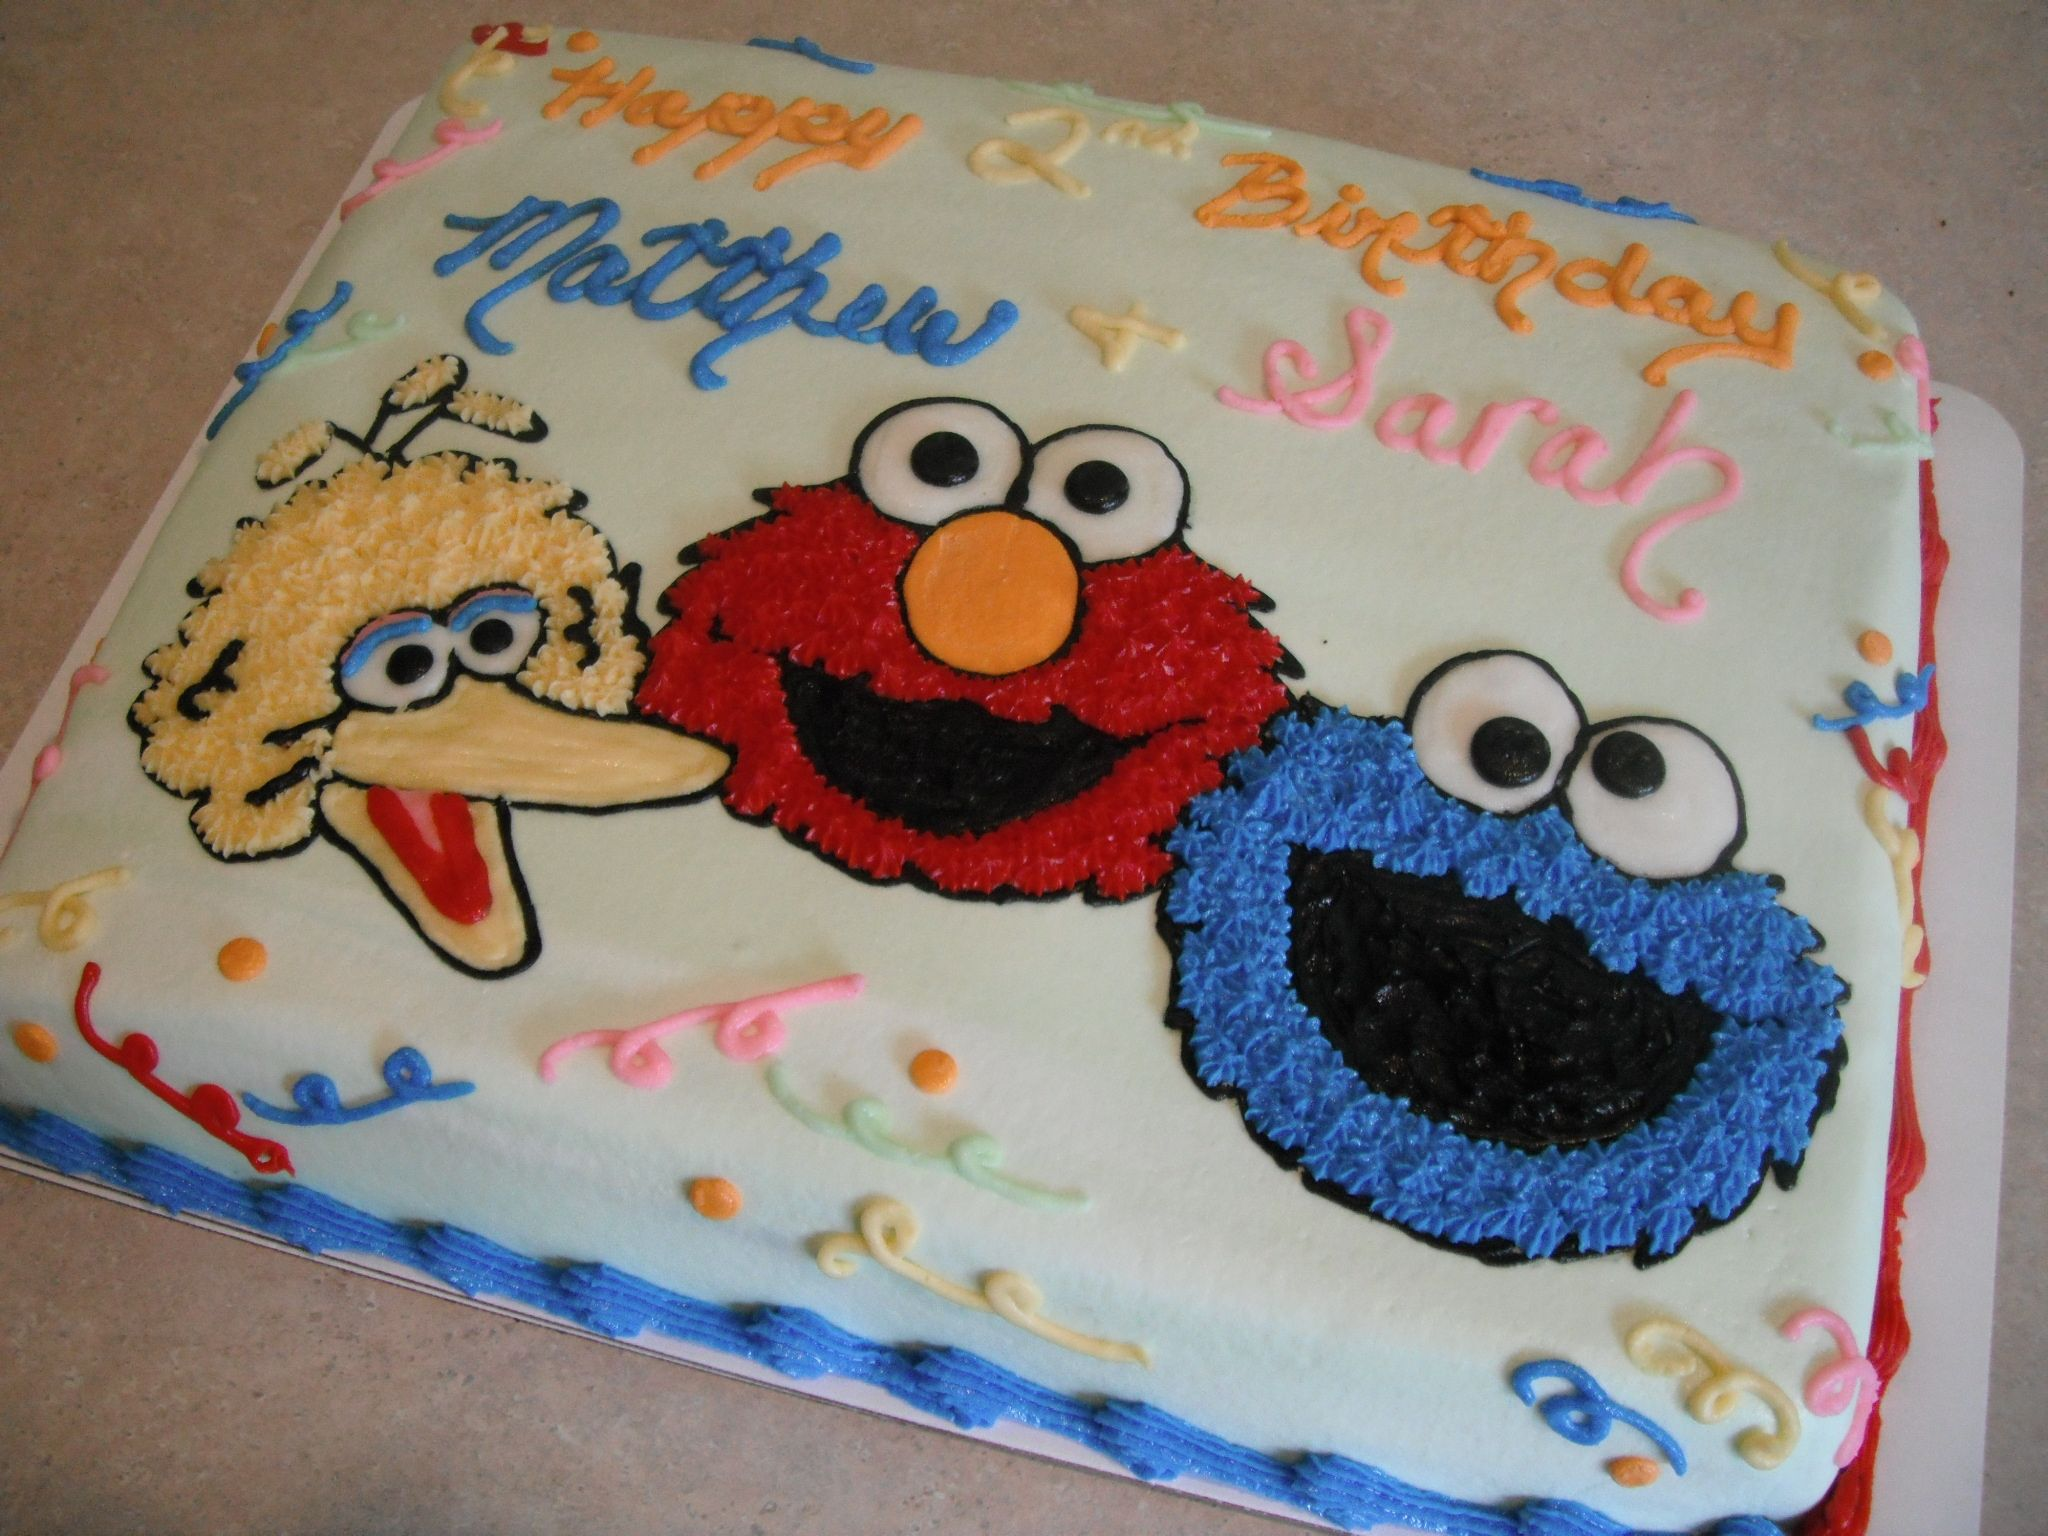 Sesame Street Birthday 1 2 Sheet Cake With Big Bird Elmo